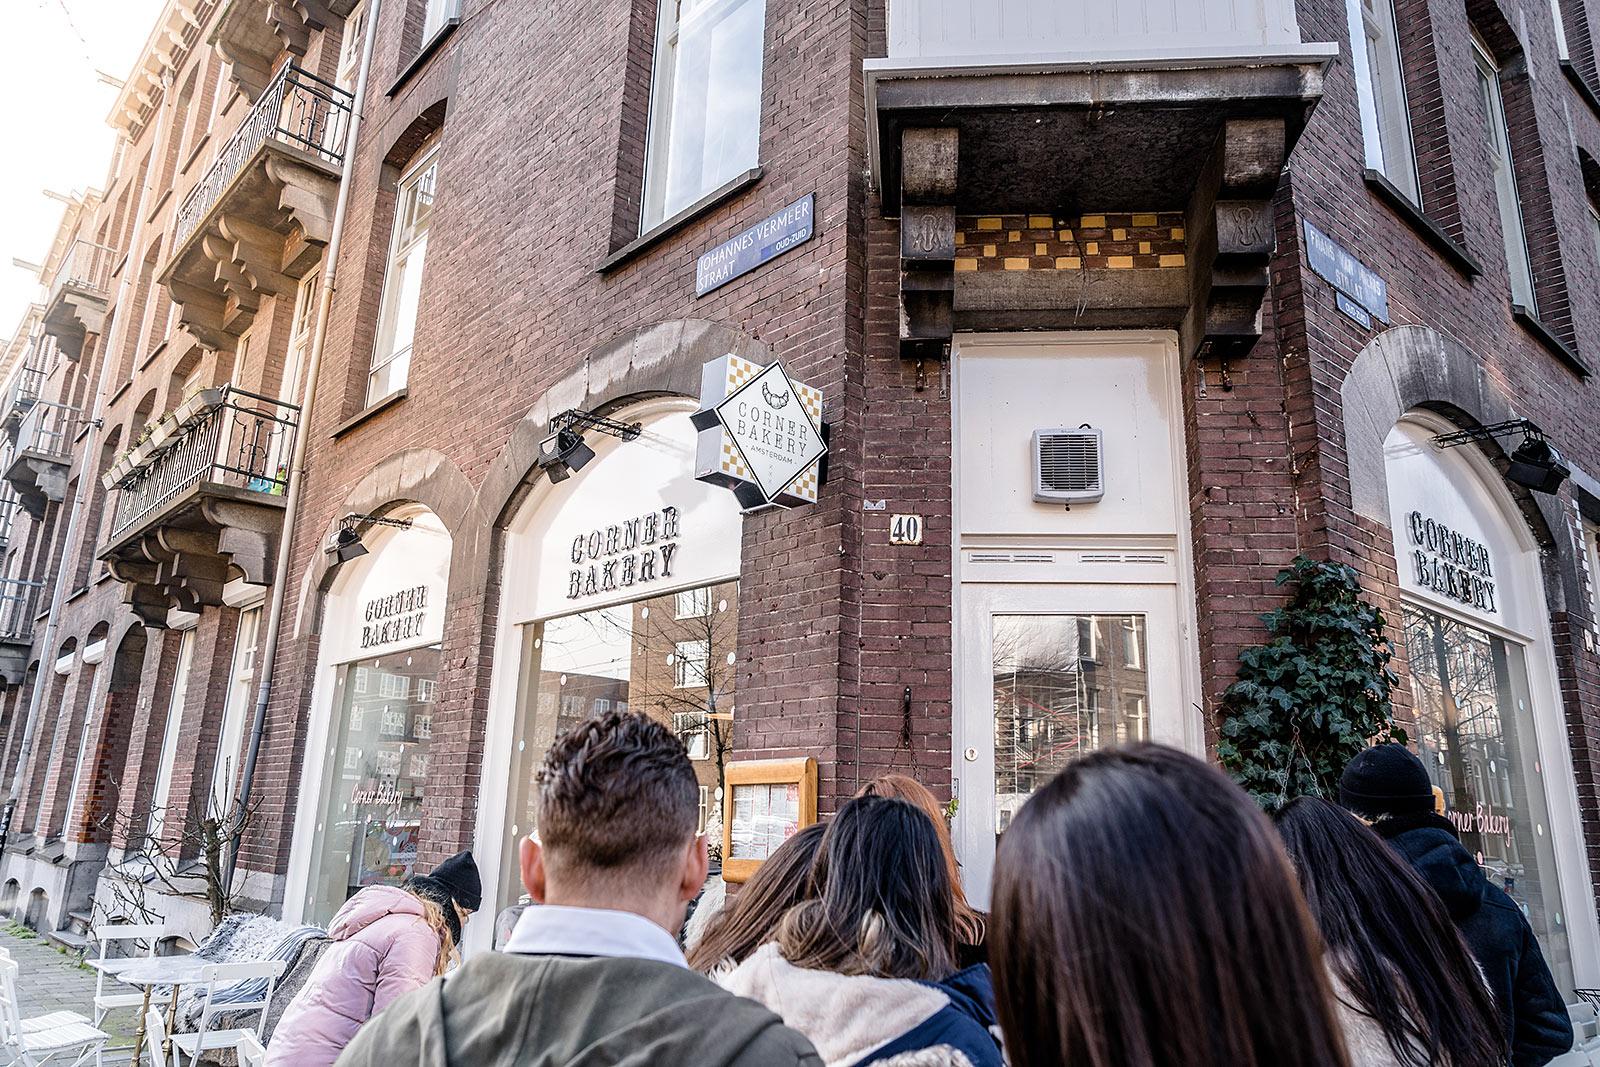 amsterdam corner bakery healthy food guide travel blog sunnyinga